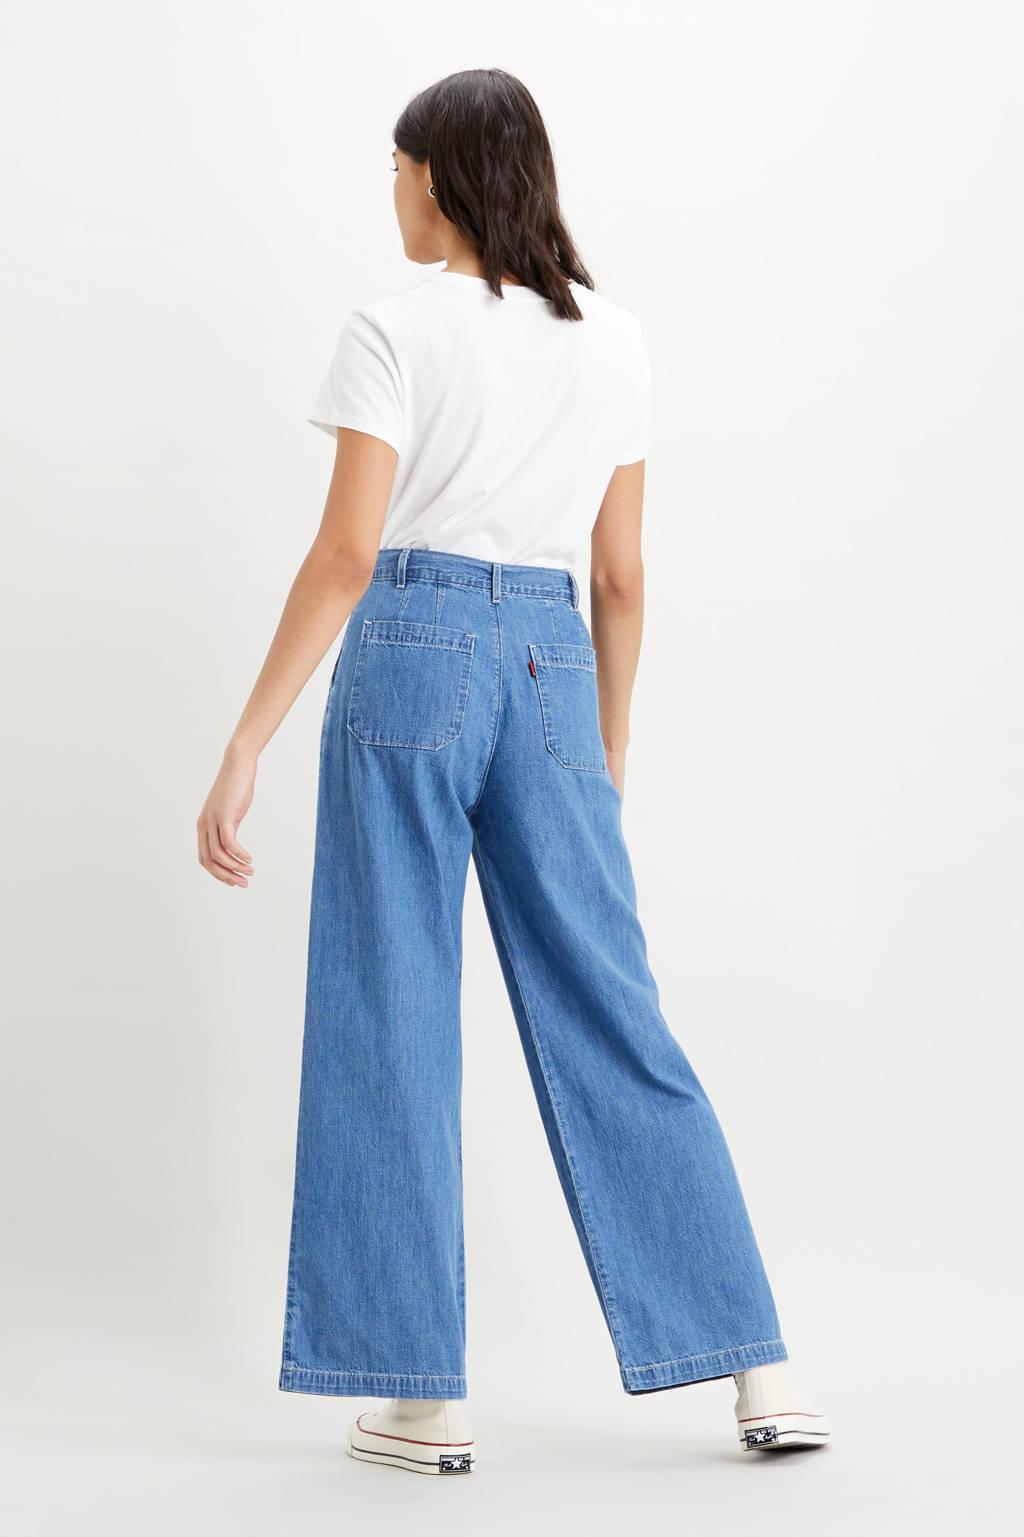 Levi's high waist loose fit jeans london indigo, LONDON INDIGO